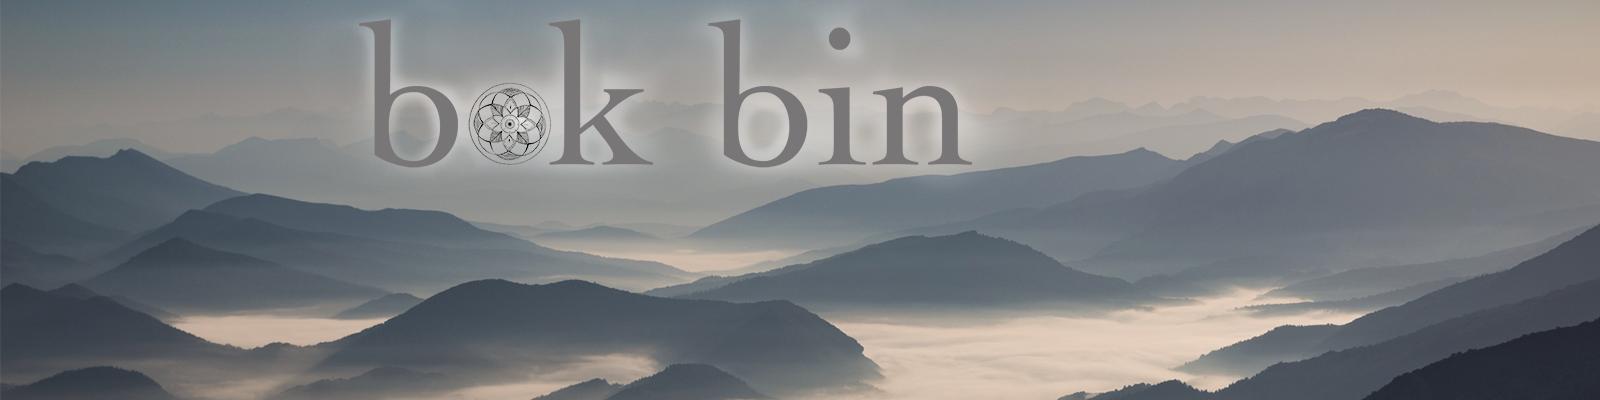 Bannière Bok Bin